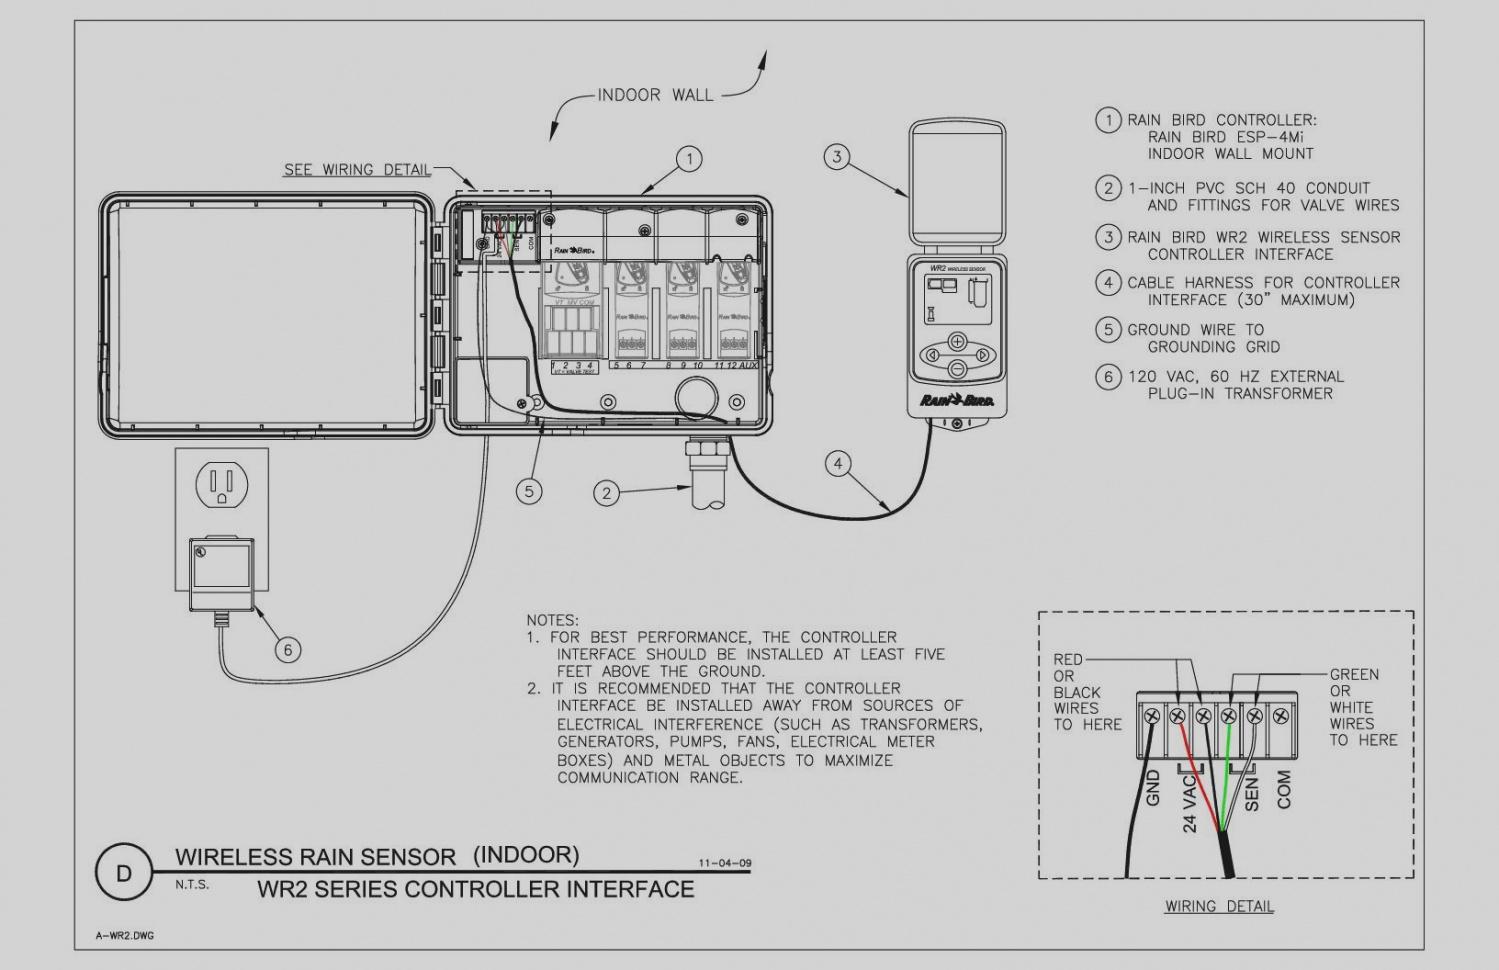 rain bird esp modular wiring diagram Download-Wiring Diagram Detail Name rain bird esp modular wiring diagram – Elegant Sprinkler System Wiring Diagram Rain Bird CAD Detail 9-g